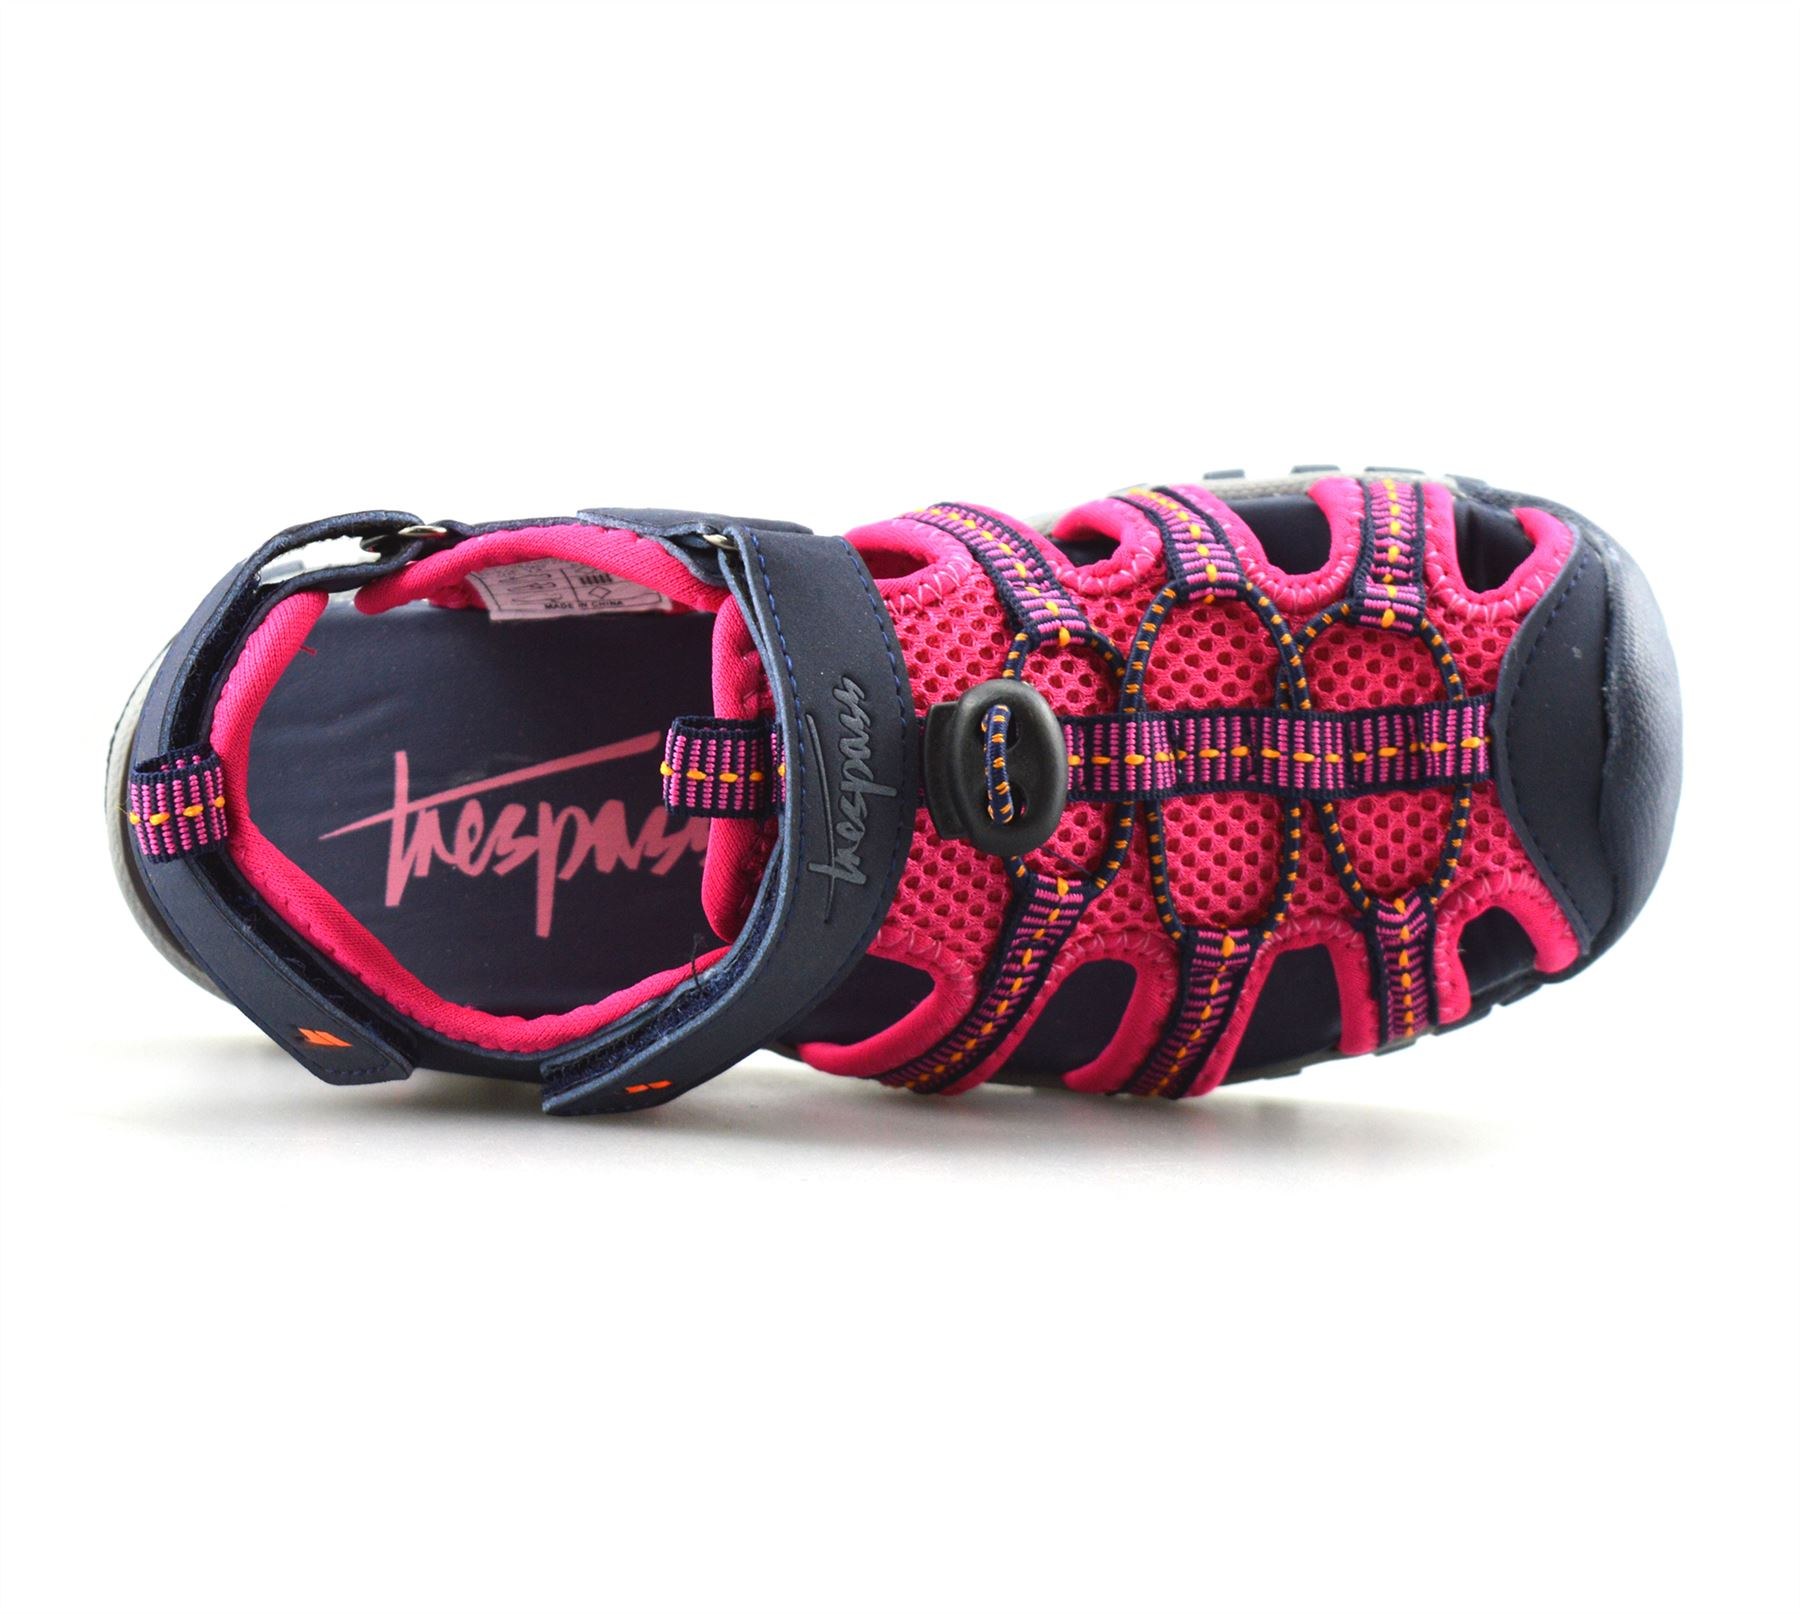 Boys-Girls-Kids-Trespass-Summer-Beach-Casual-Walking-Sports-Sandals-Shoes-Size thumbnail 31